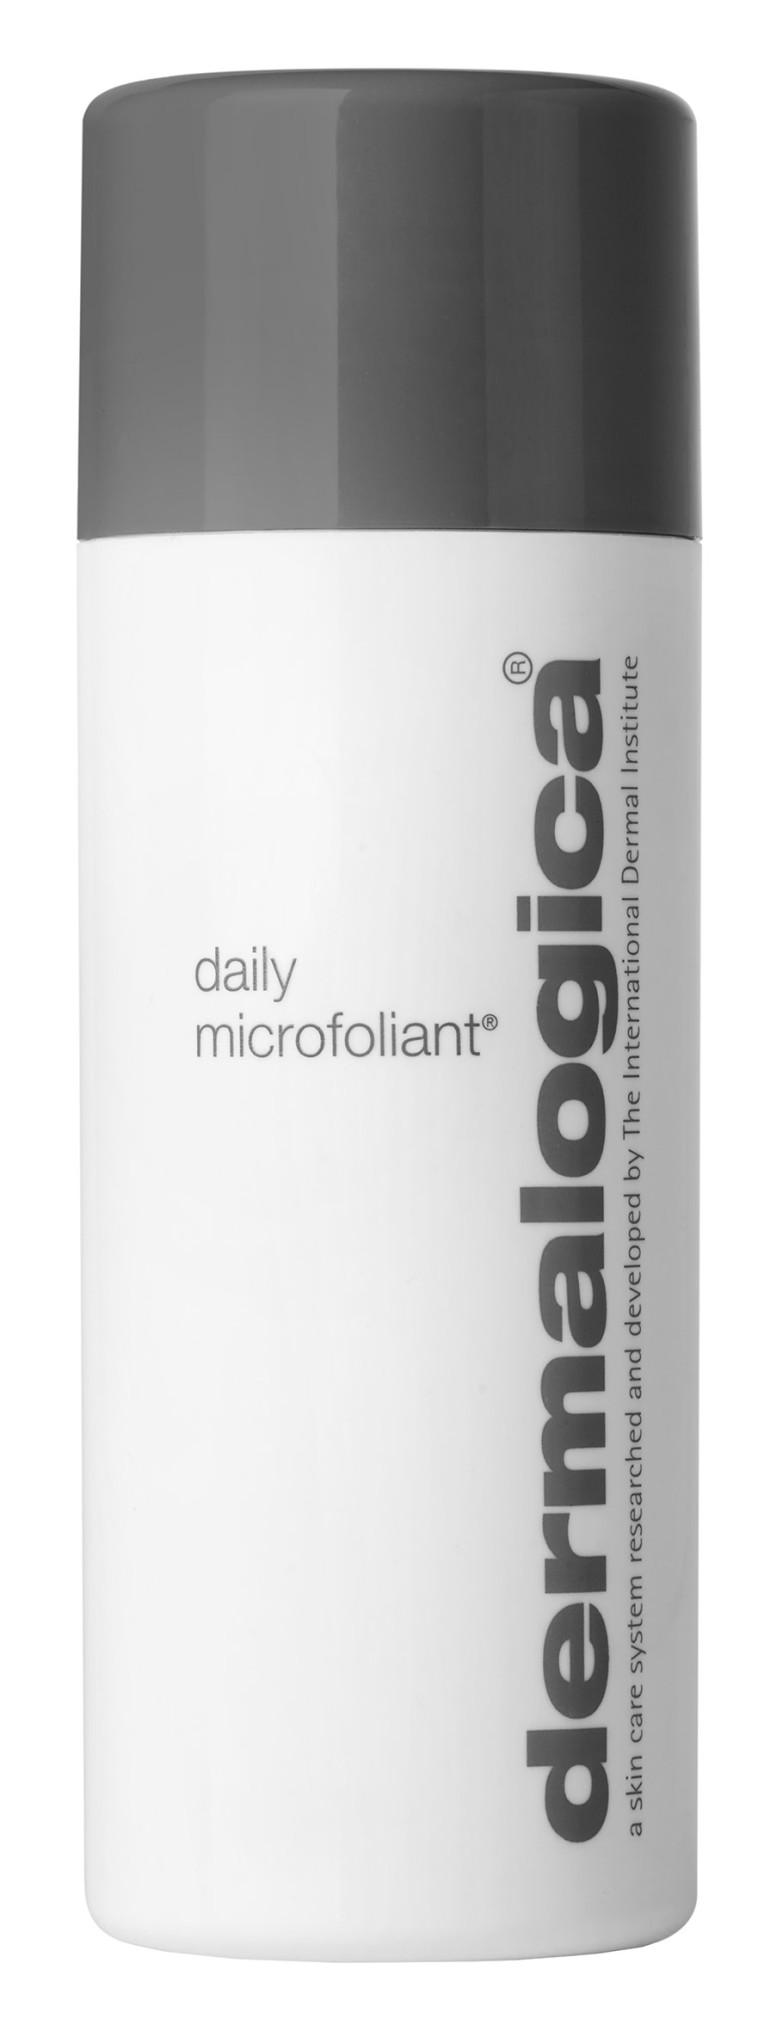 daily Microfoliant daily microfolian. דרמלוג'יקה. מחיר 287 שקל (צילום: יח''צ)